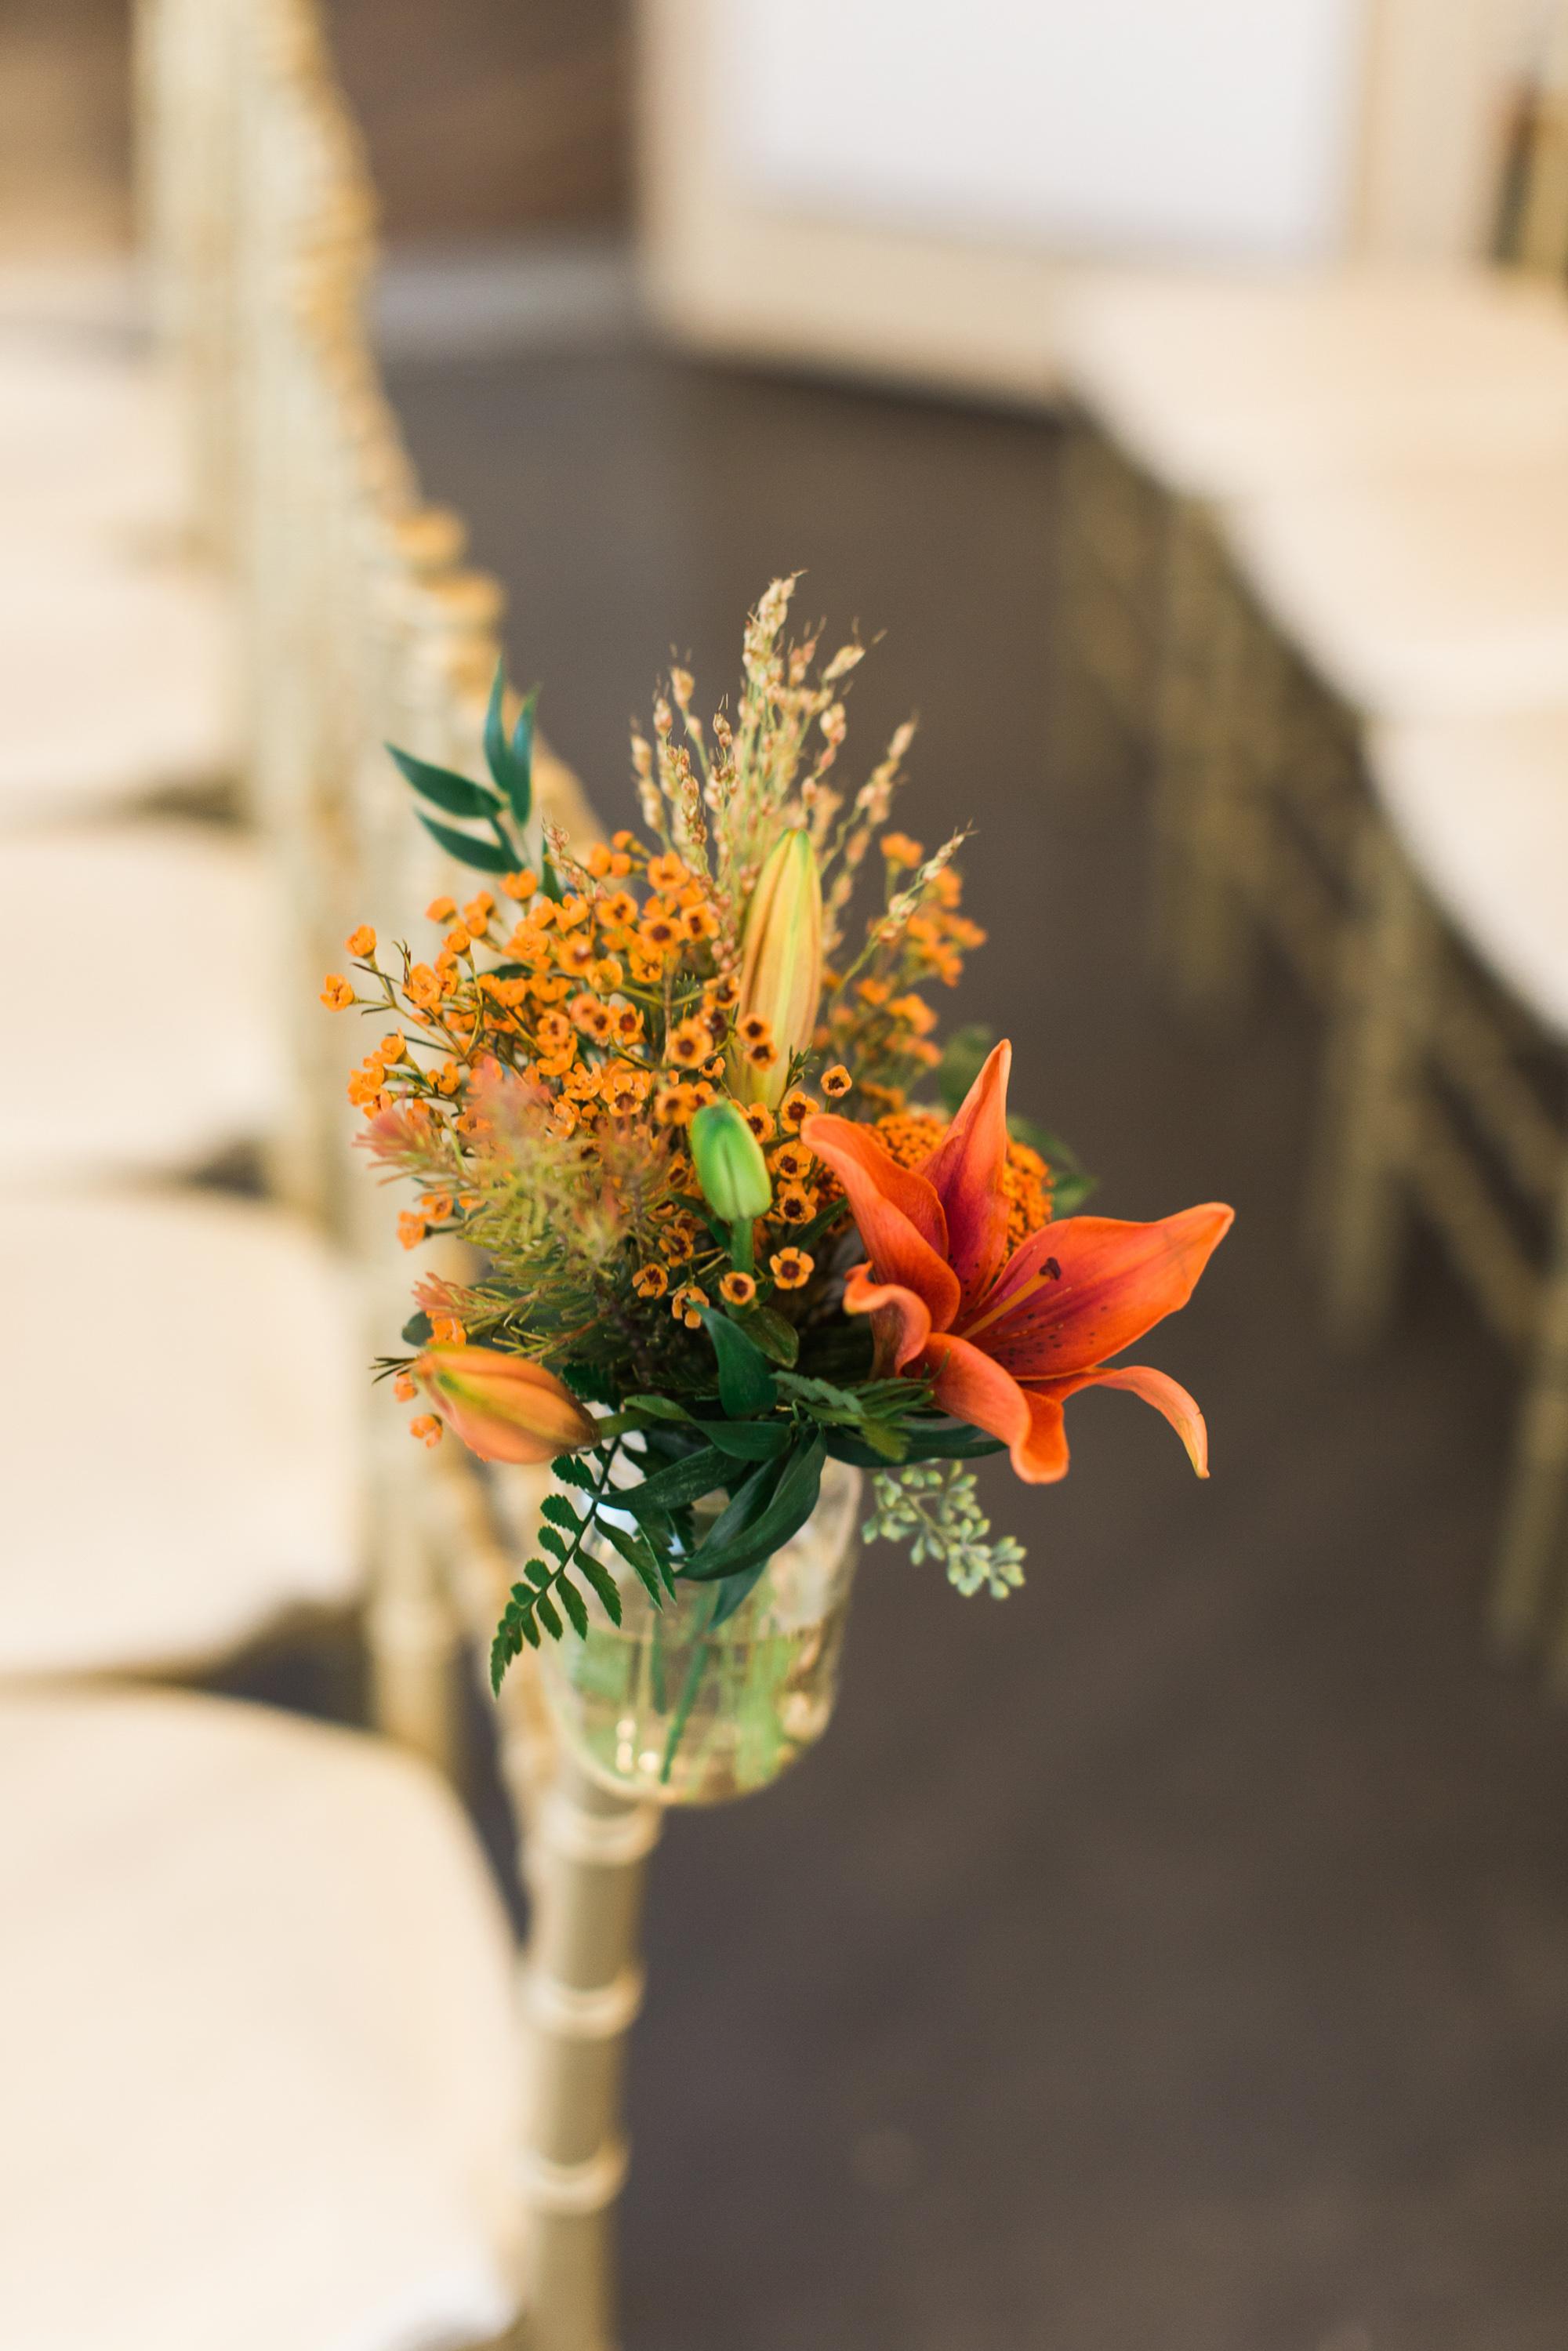 abd3e-messina-hof-wedding-33messina-hof-wedding-33.jpg